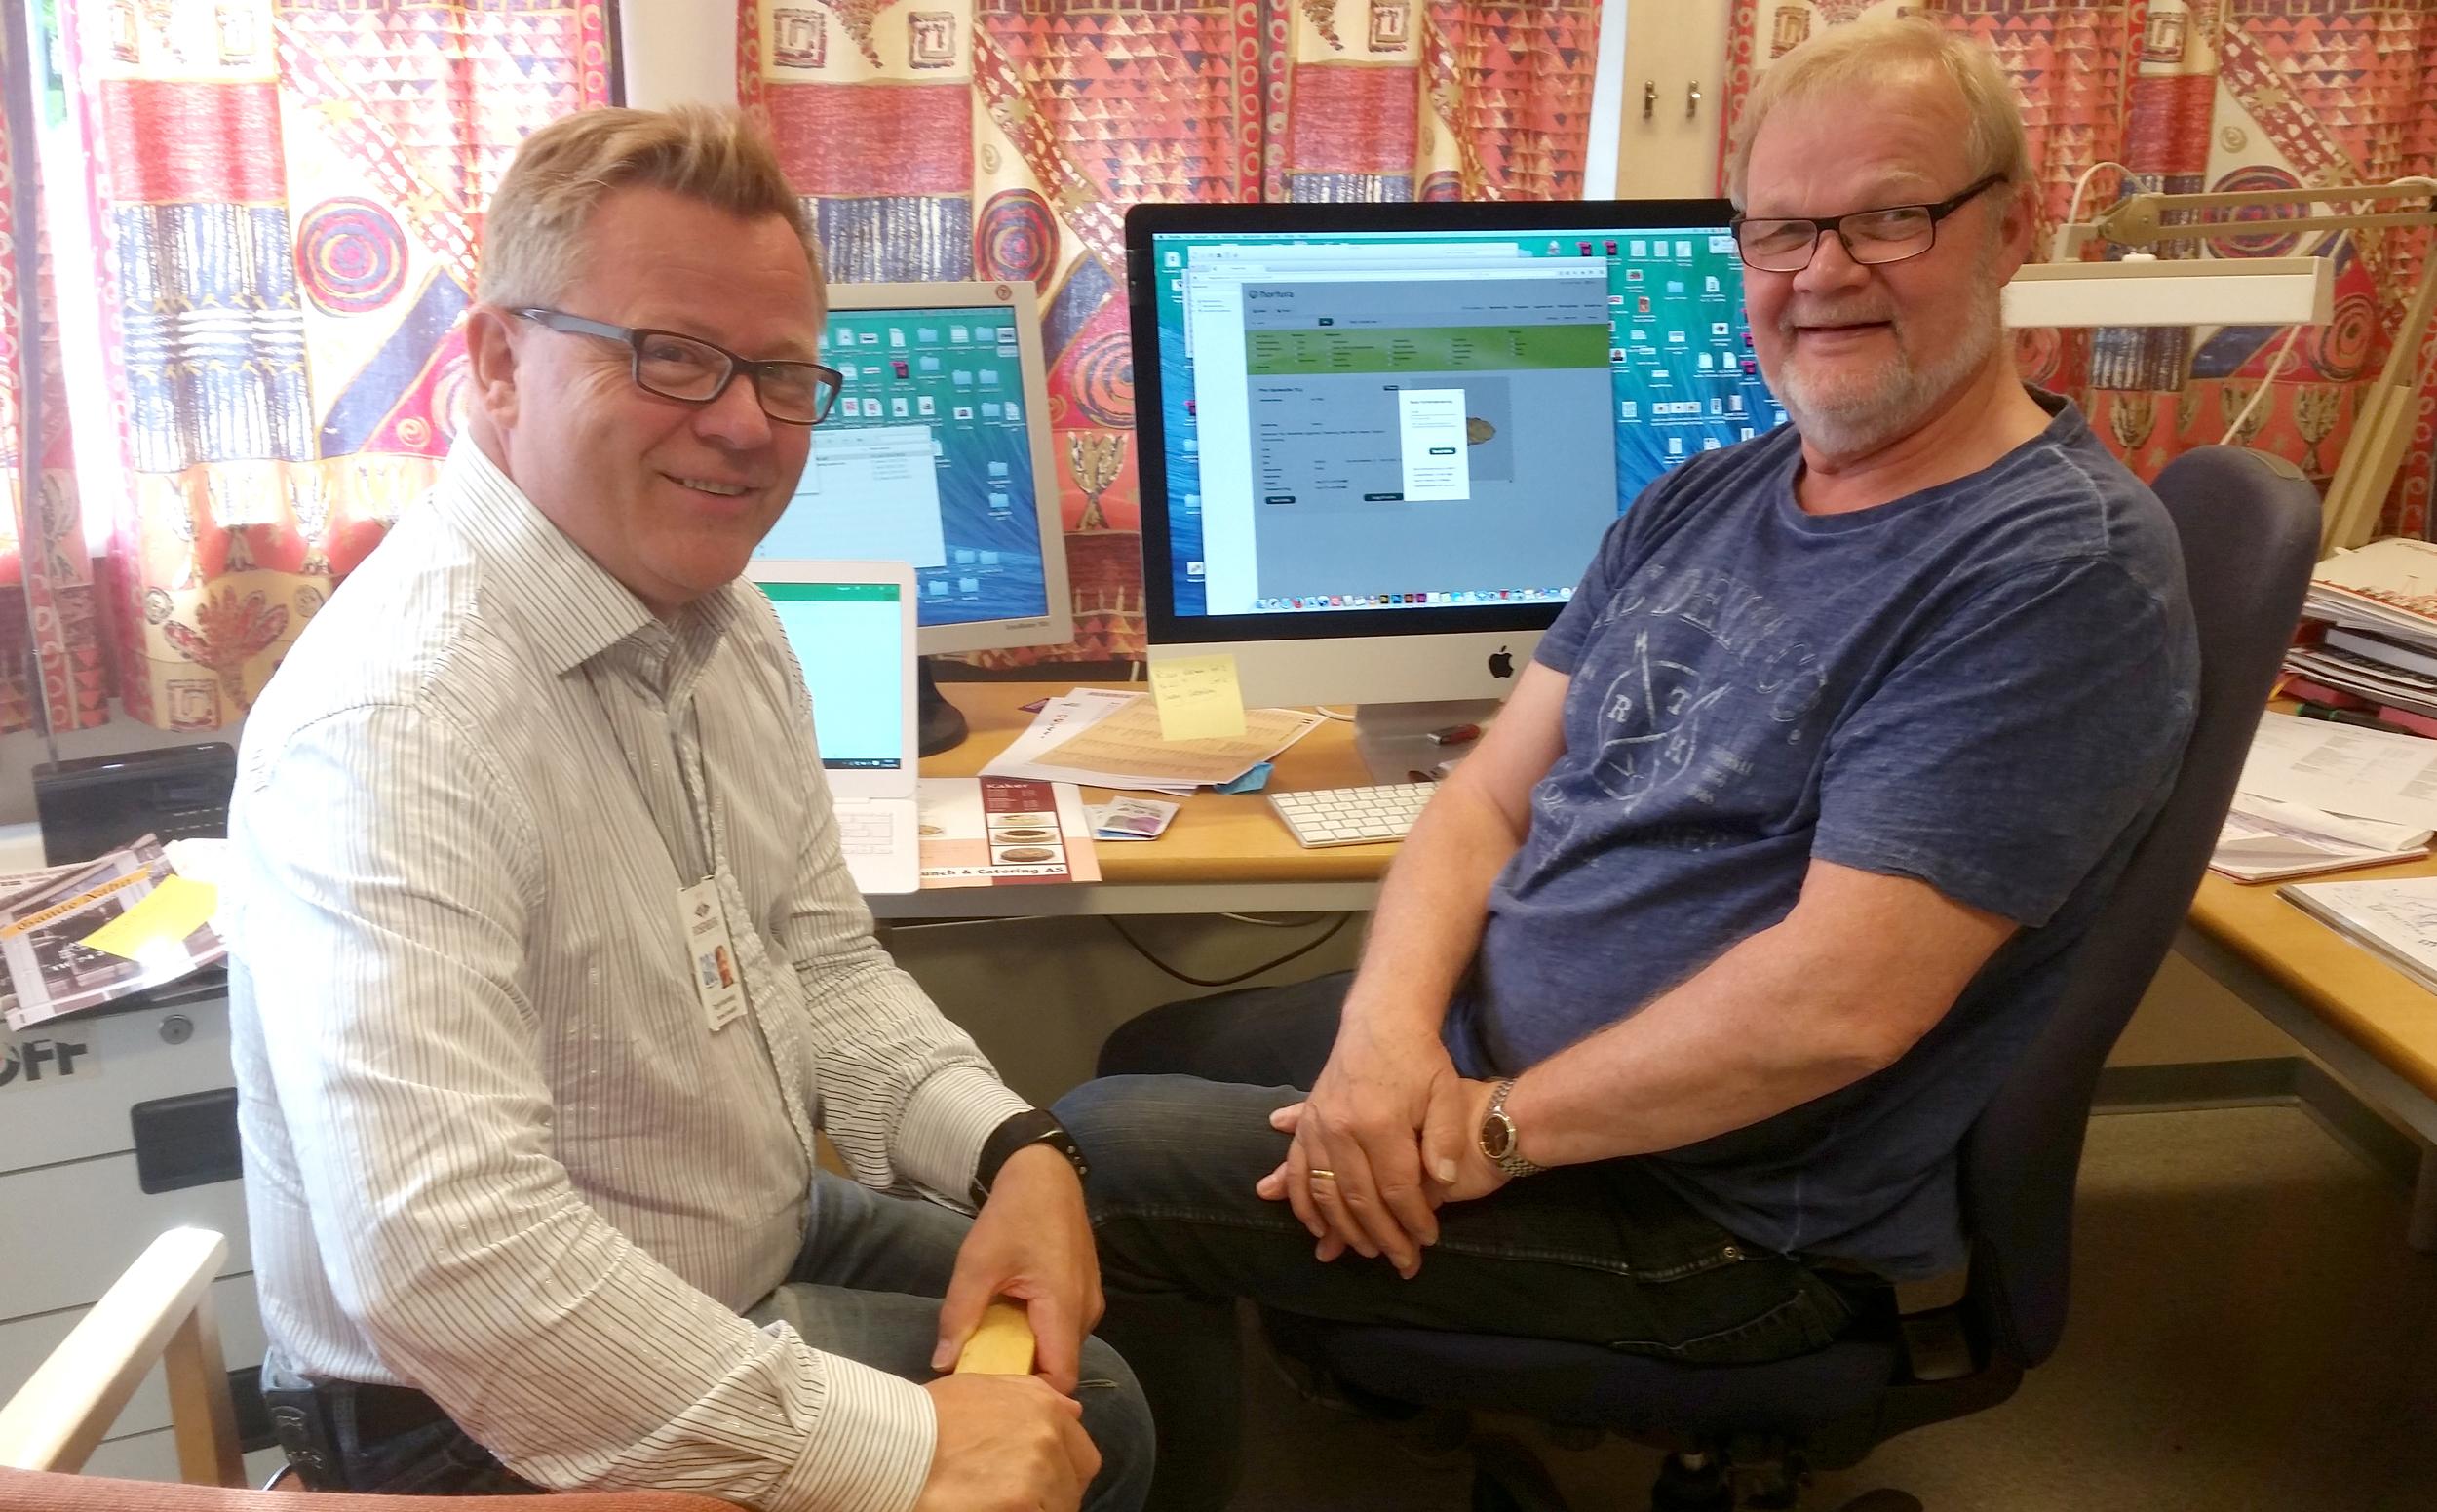 Terje Kvernberg fra GO2 arena og Finn i Samkjøp, forbereder salgsmateriellet til Scandia Cup 2016